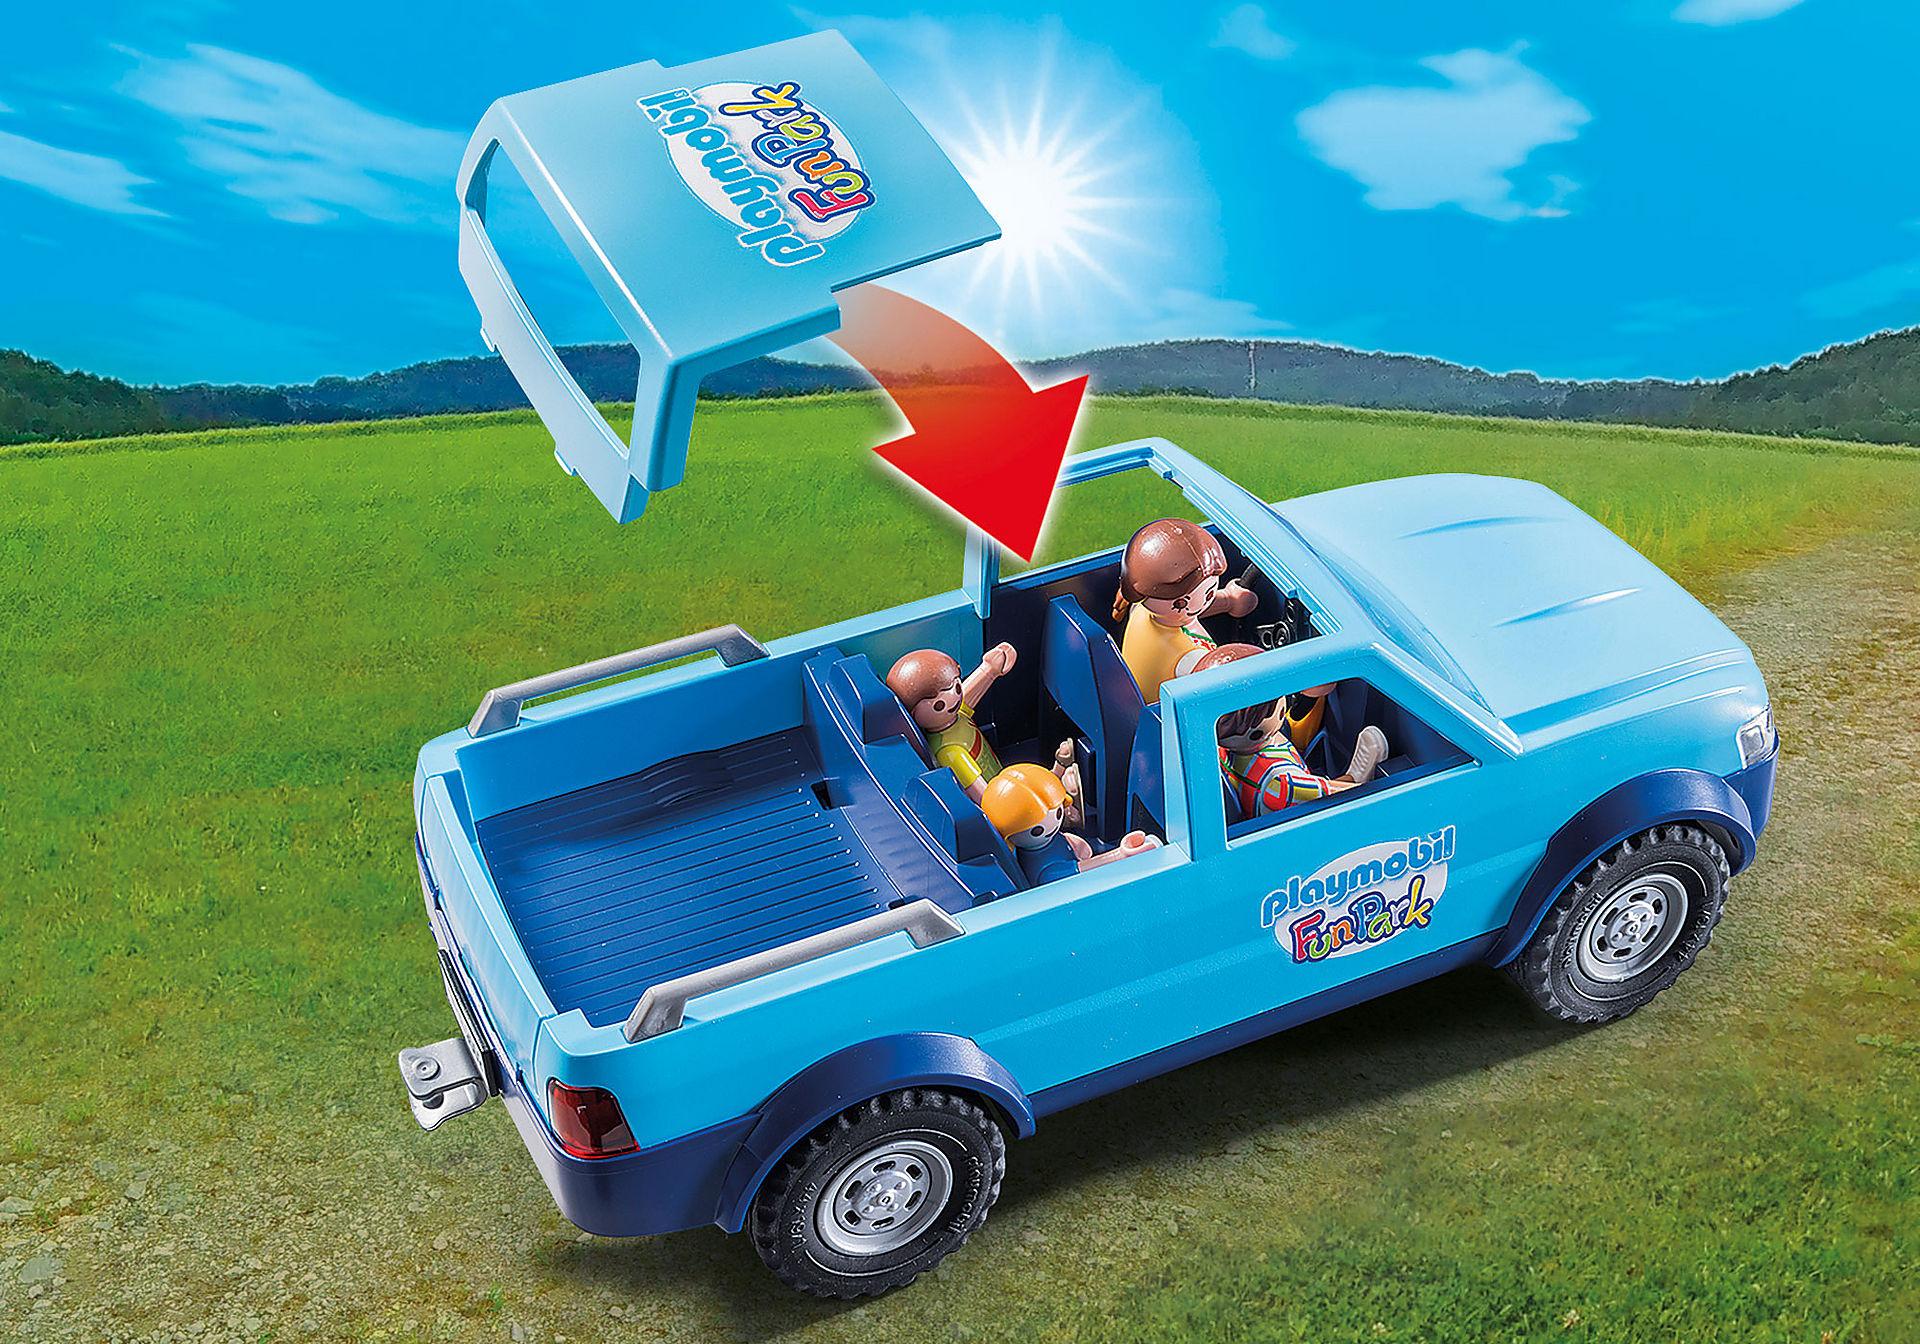 http://media.playmobil.com/i/playmobil/9502_product_extra1/PLAYMOBIL-FunPark Pickup with Camper